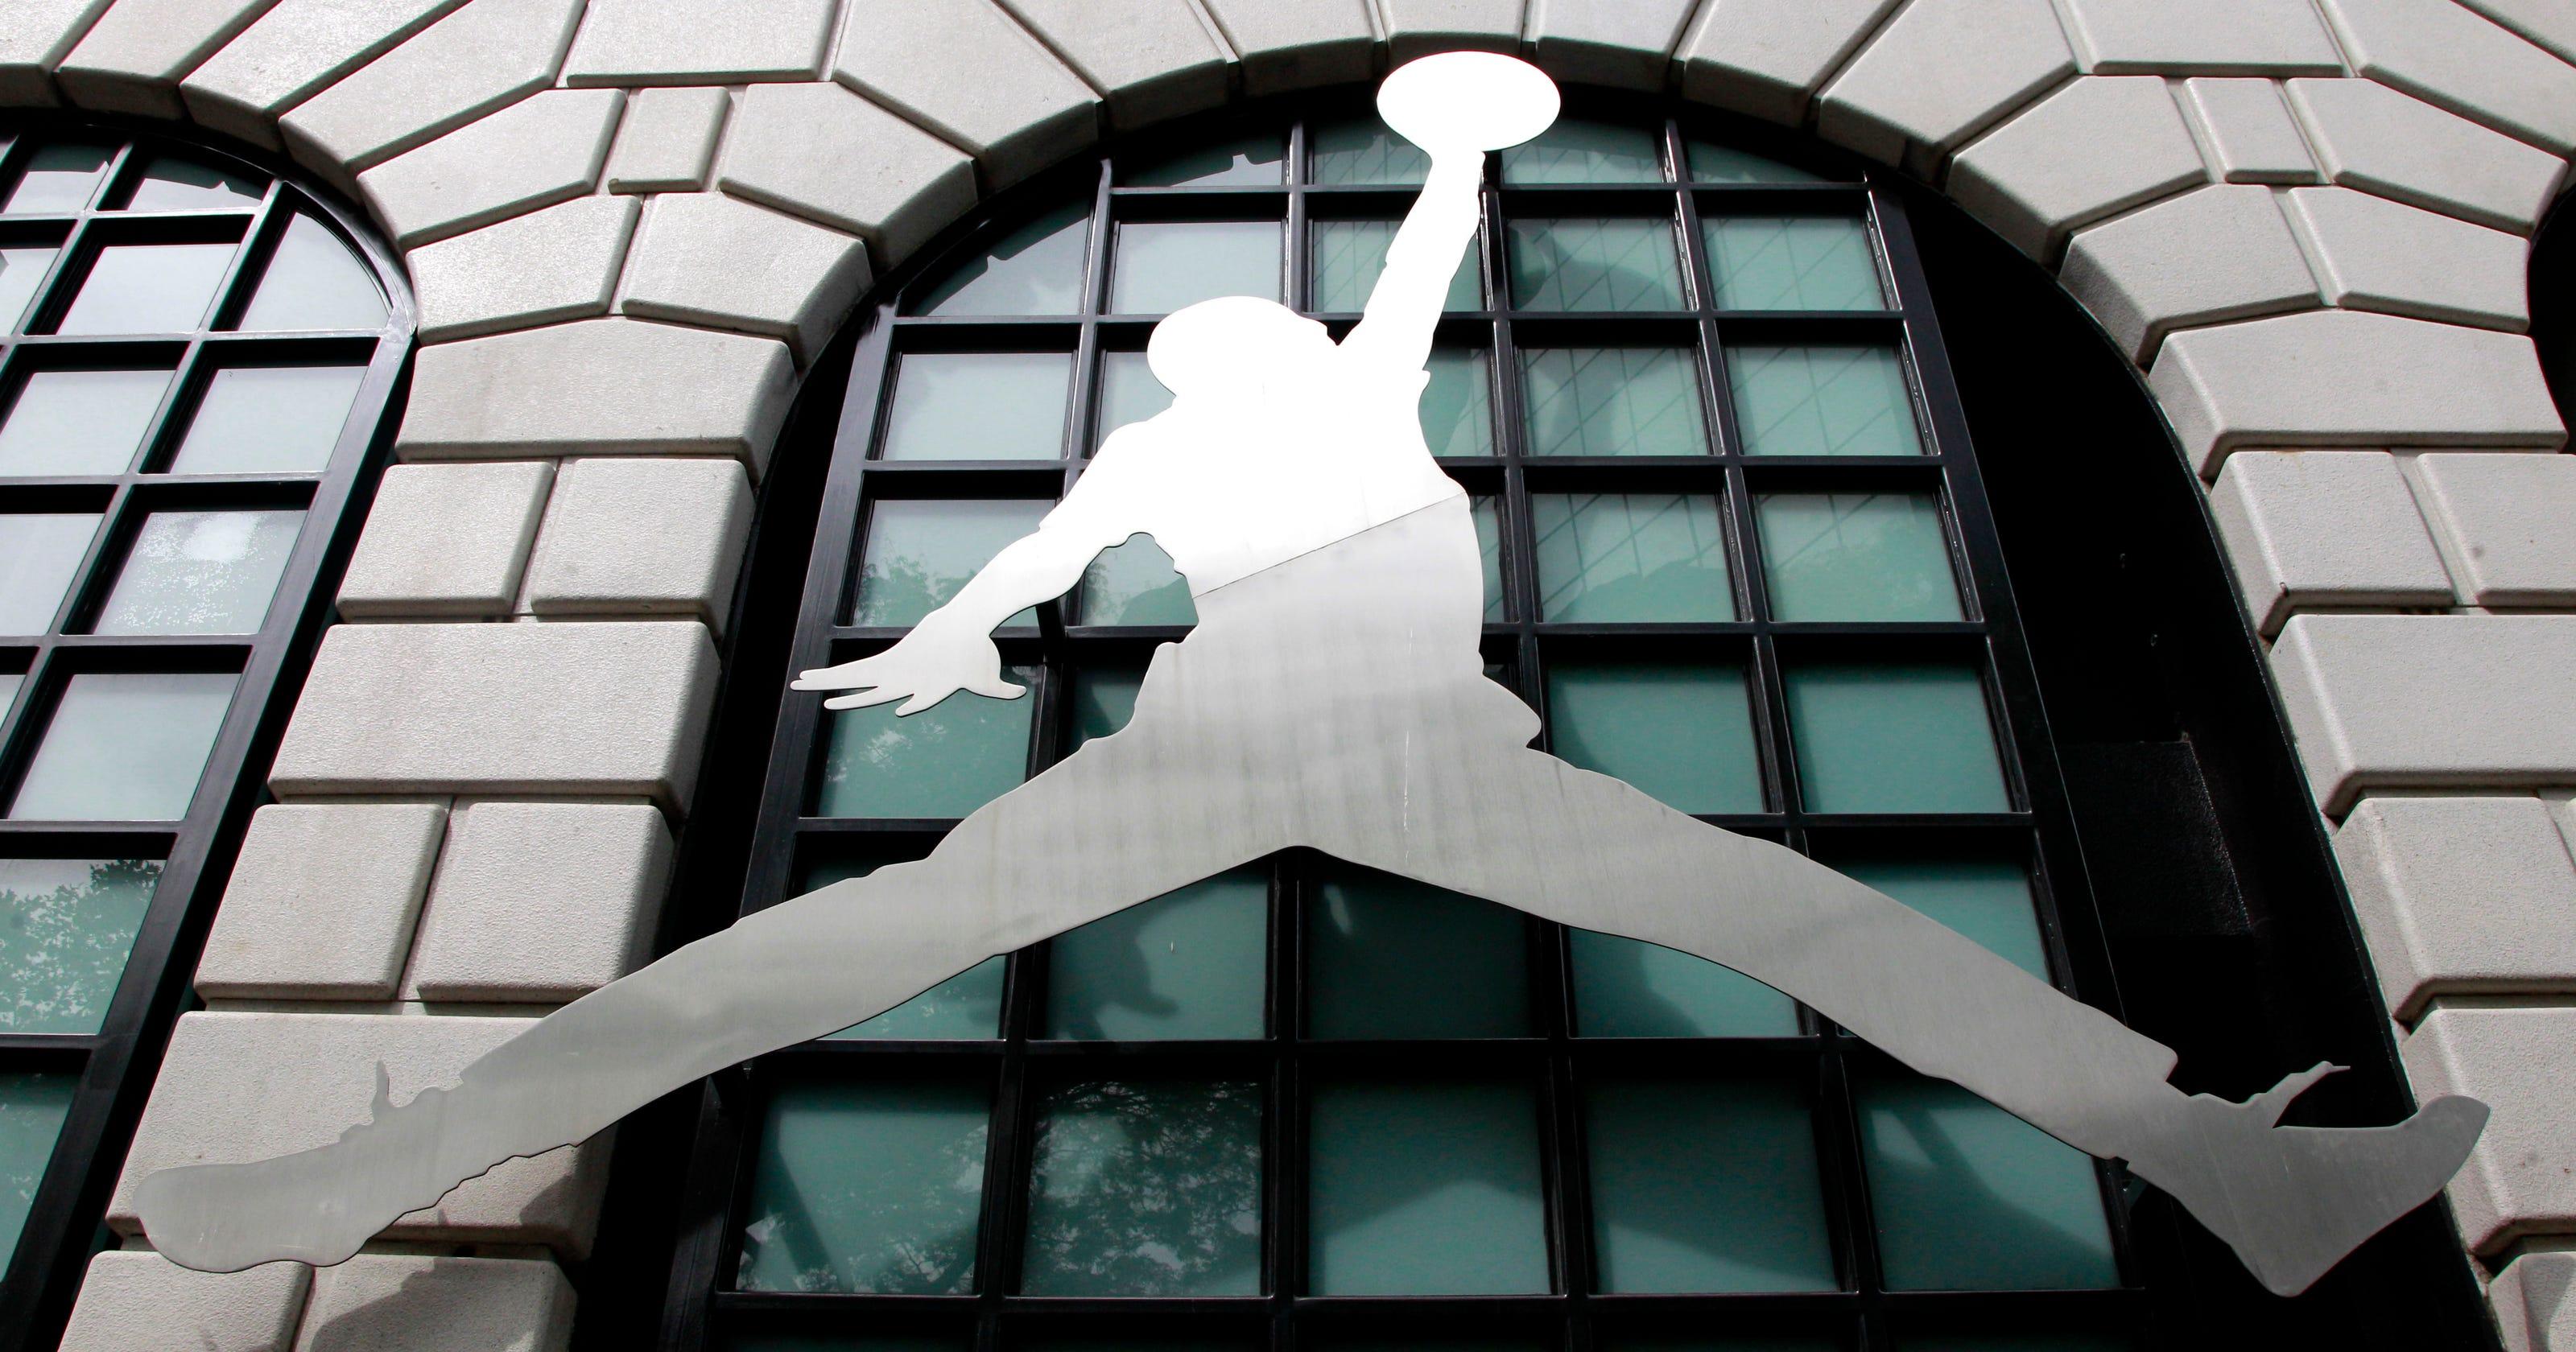 online store 30636 53786 Error Jordan  Key figures still argue over who was responsible for Nike deal